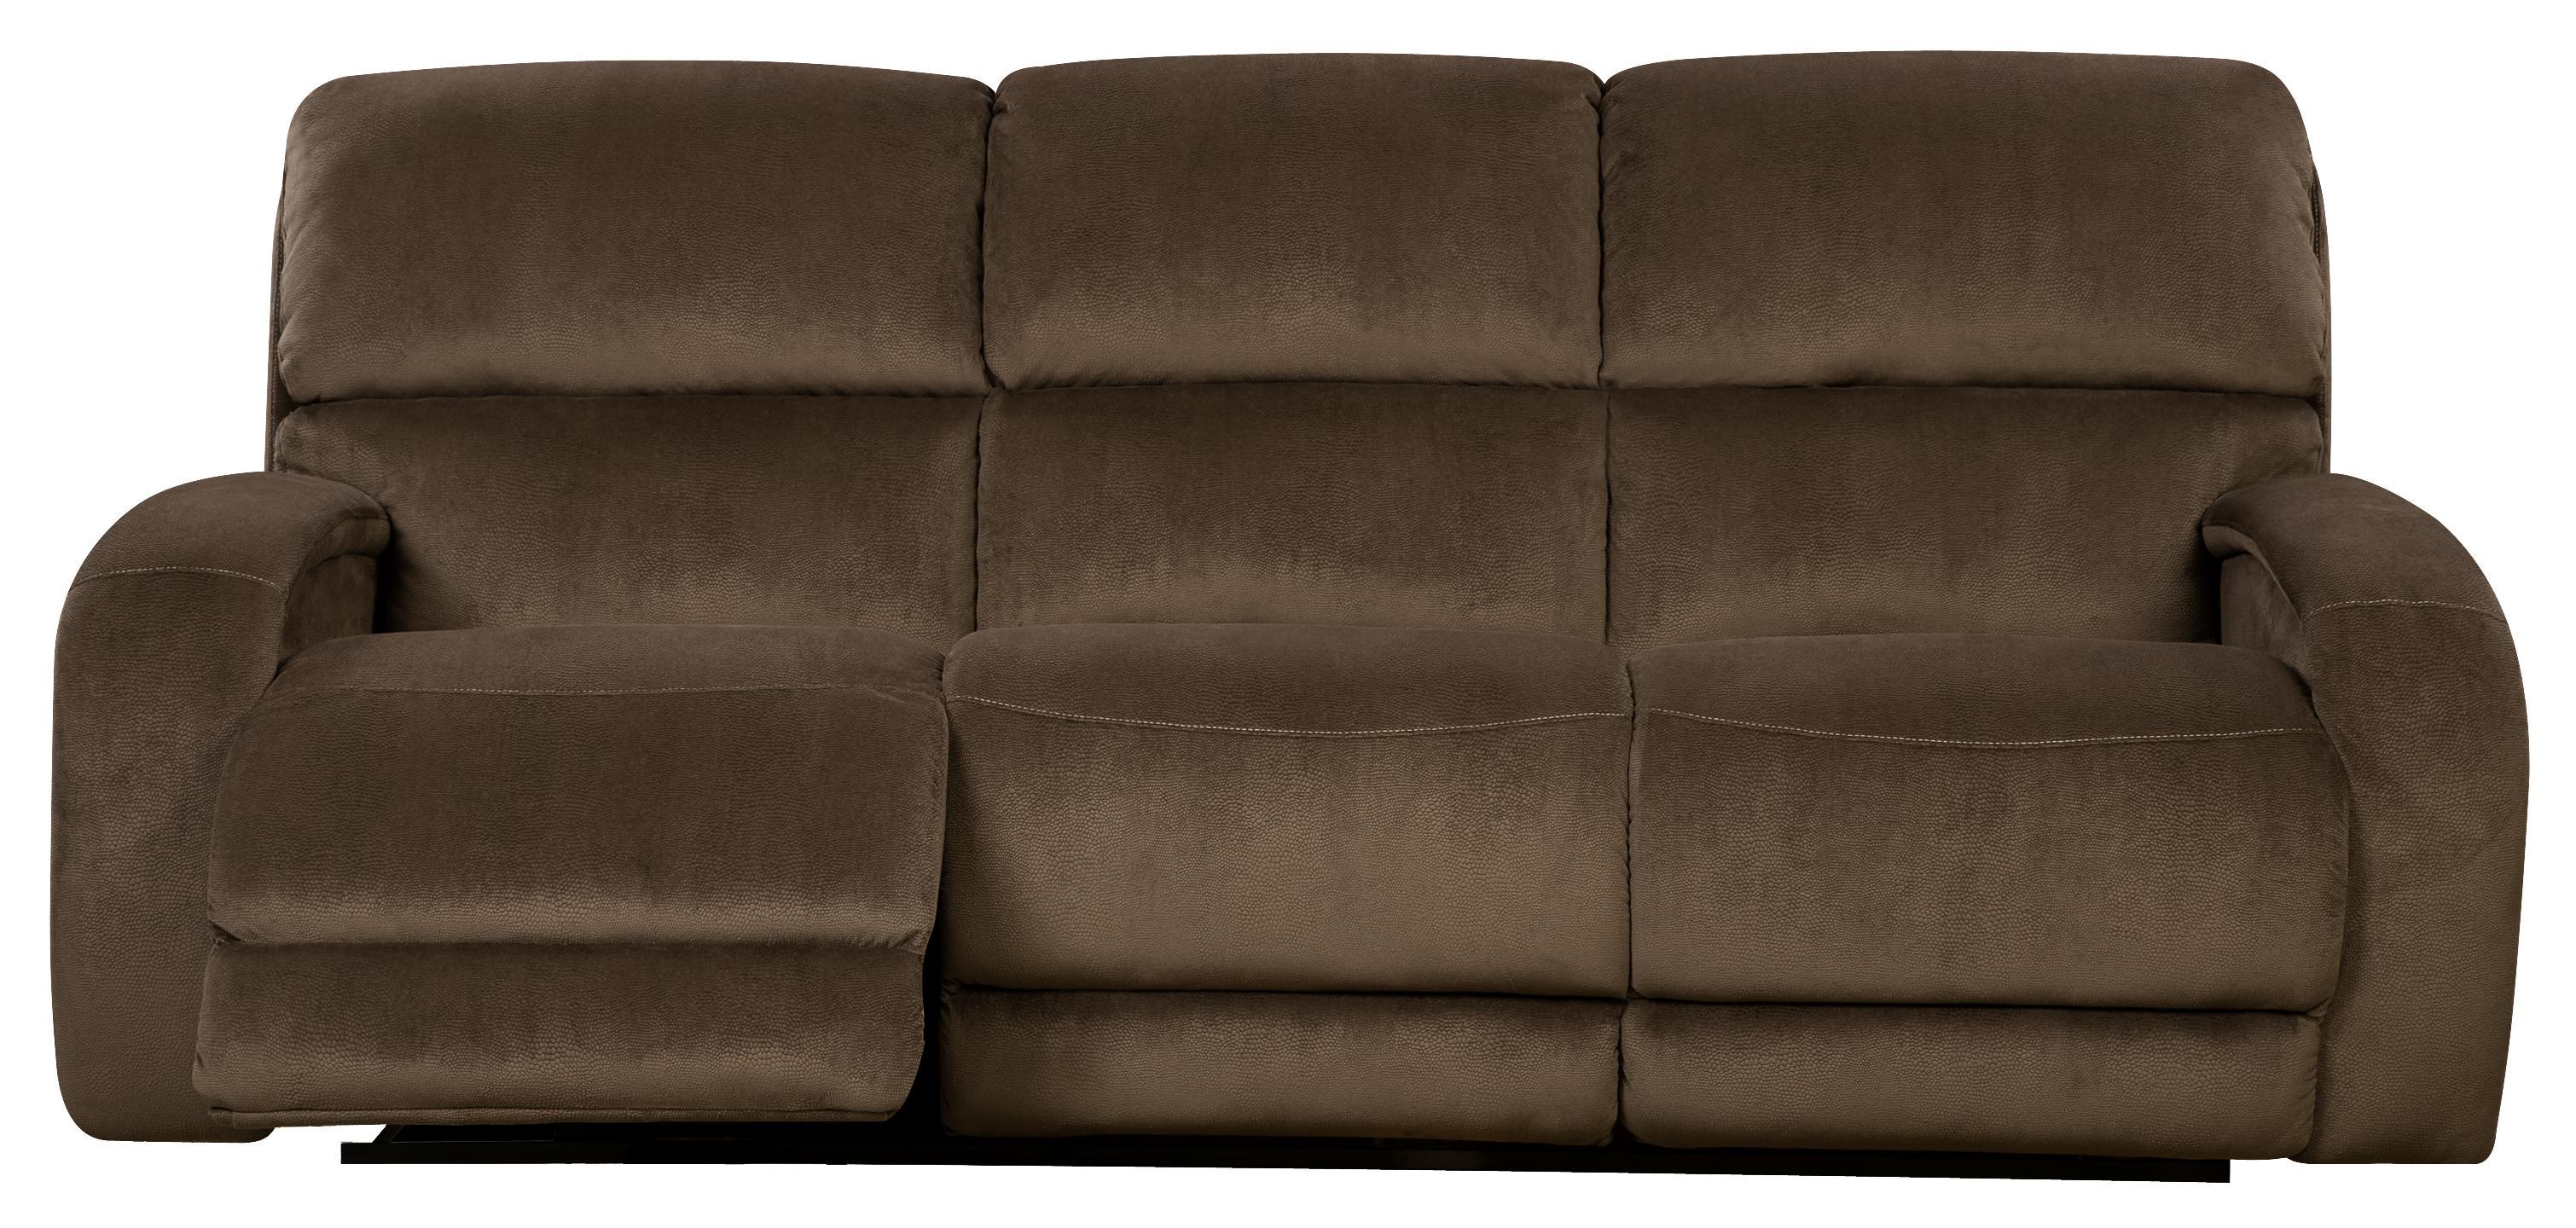 Southern Motion Fandango 884 Power Headrest Reclining Sofa